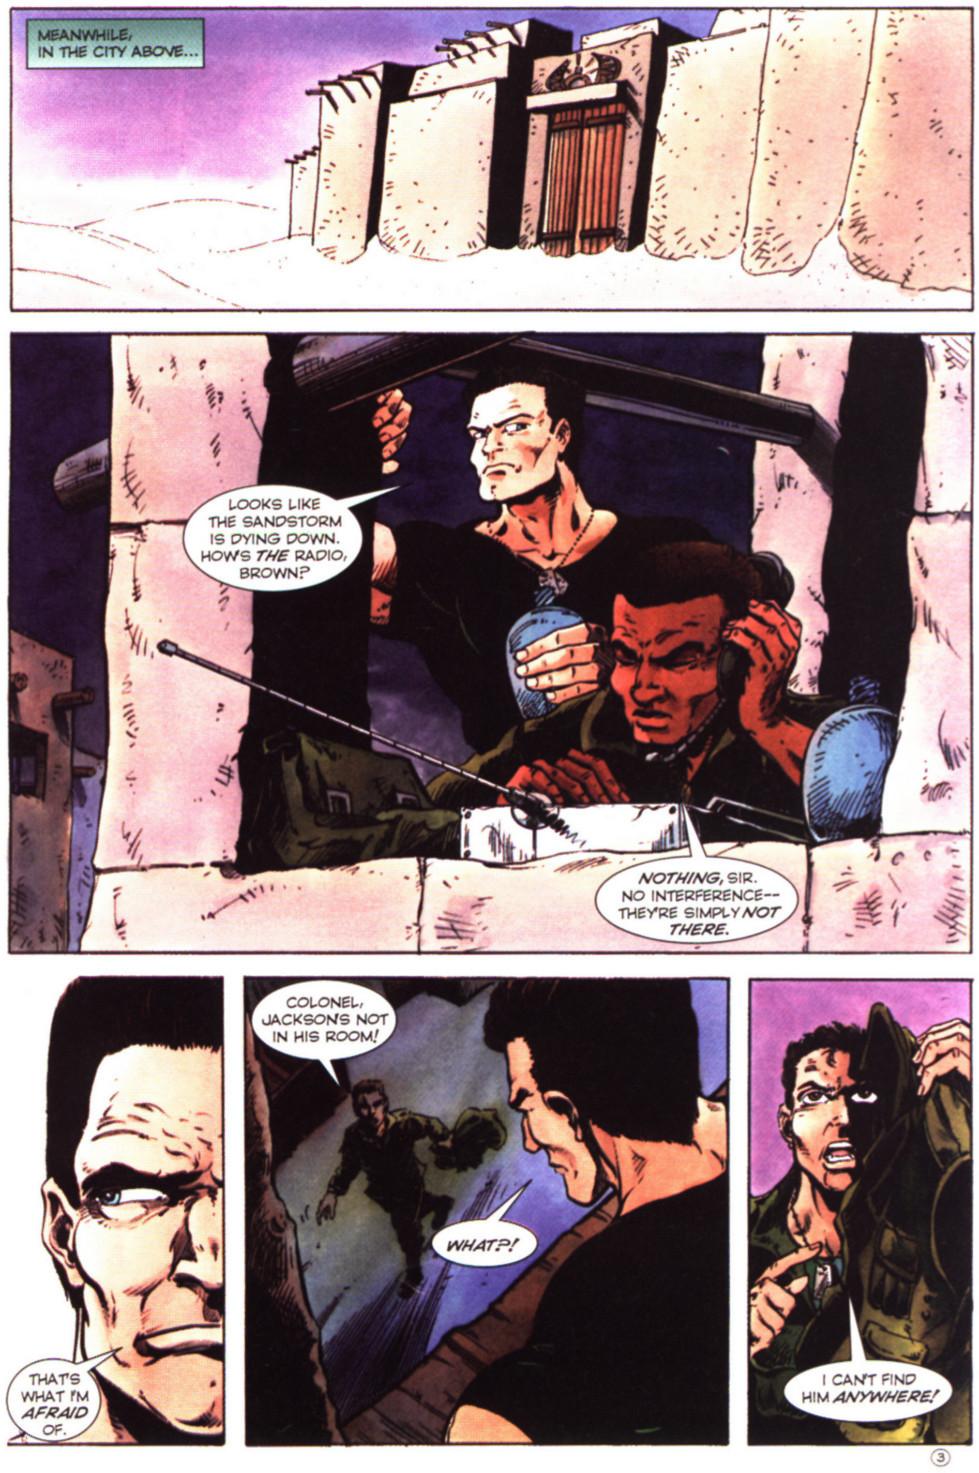 Read online Stargate comic -  Issue #2 - 5